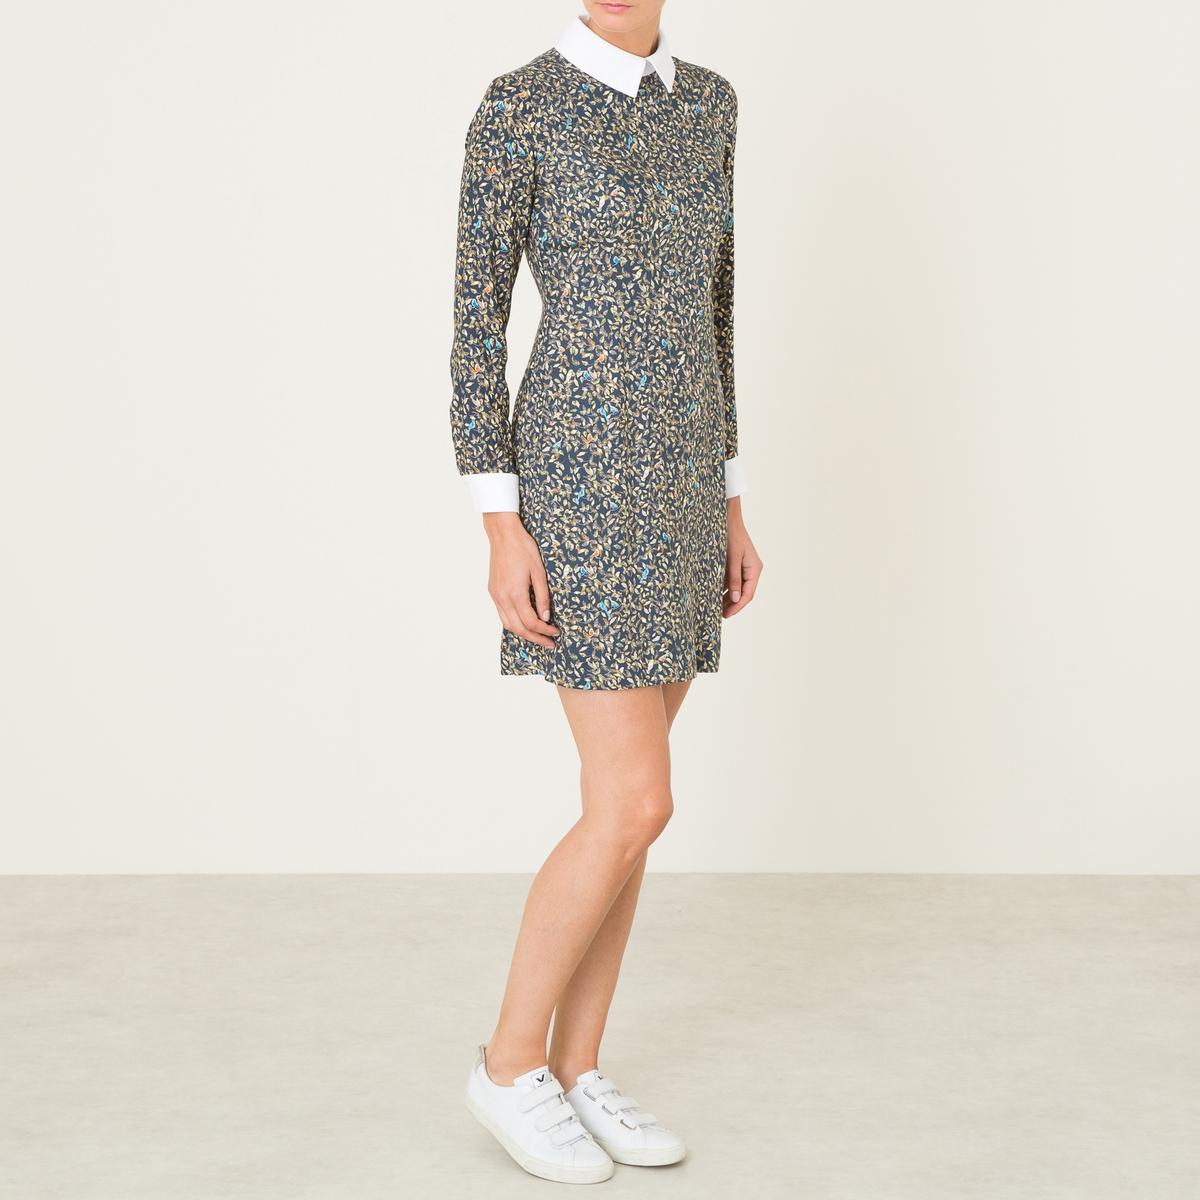 Платье SELHIBOUX EXCLUSIVITE BRAND BOUTIQUE helen williams paul and virginia